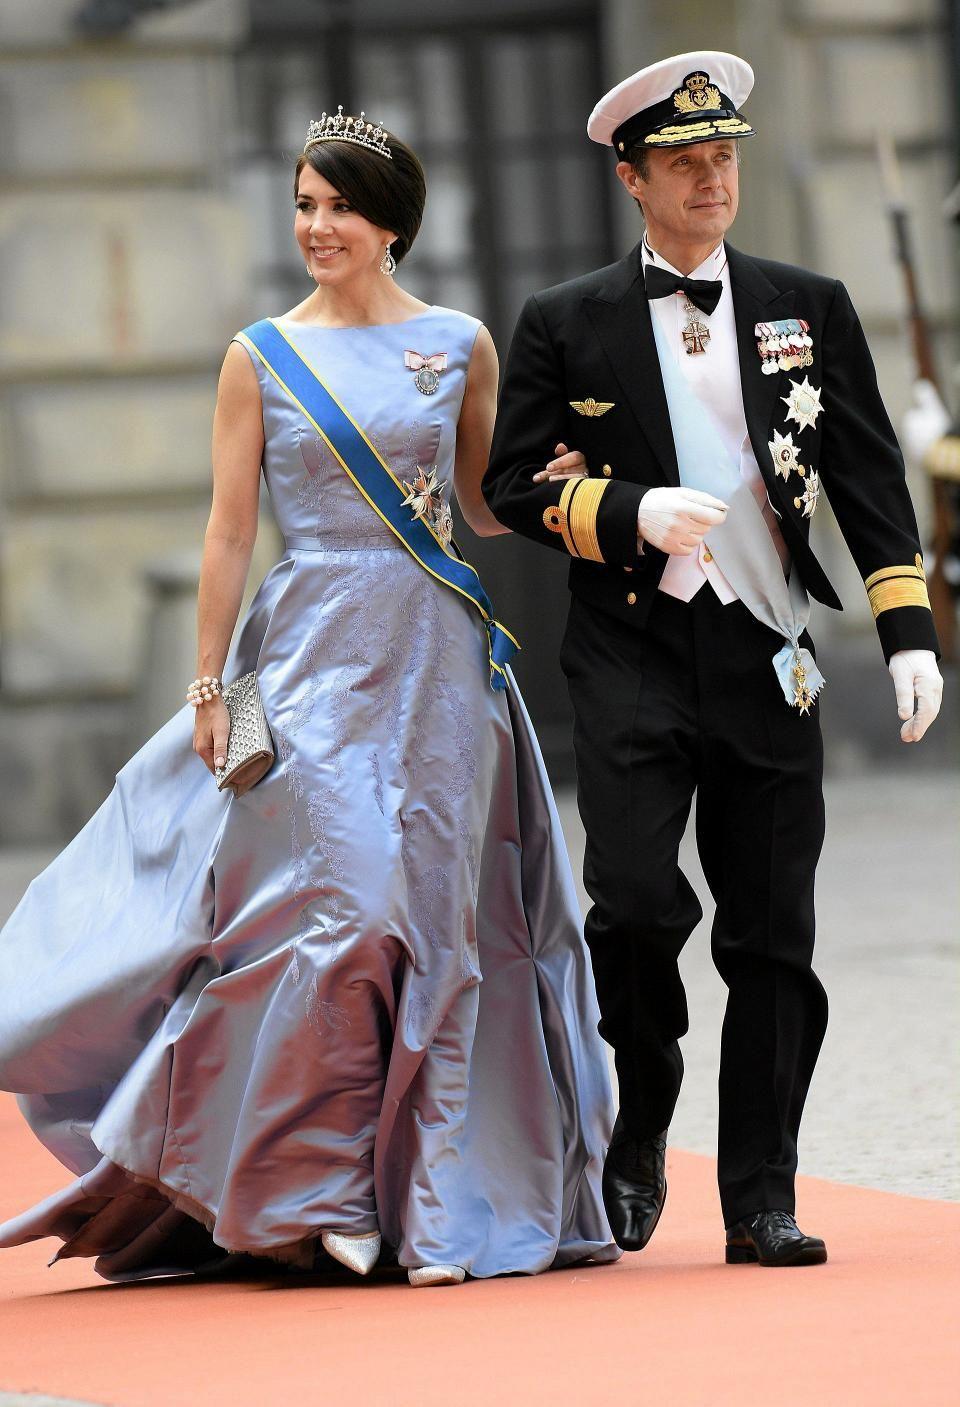 Tanskan Frederik Ja Mary